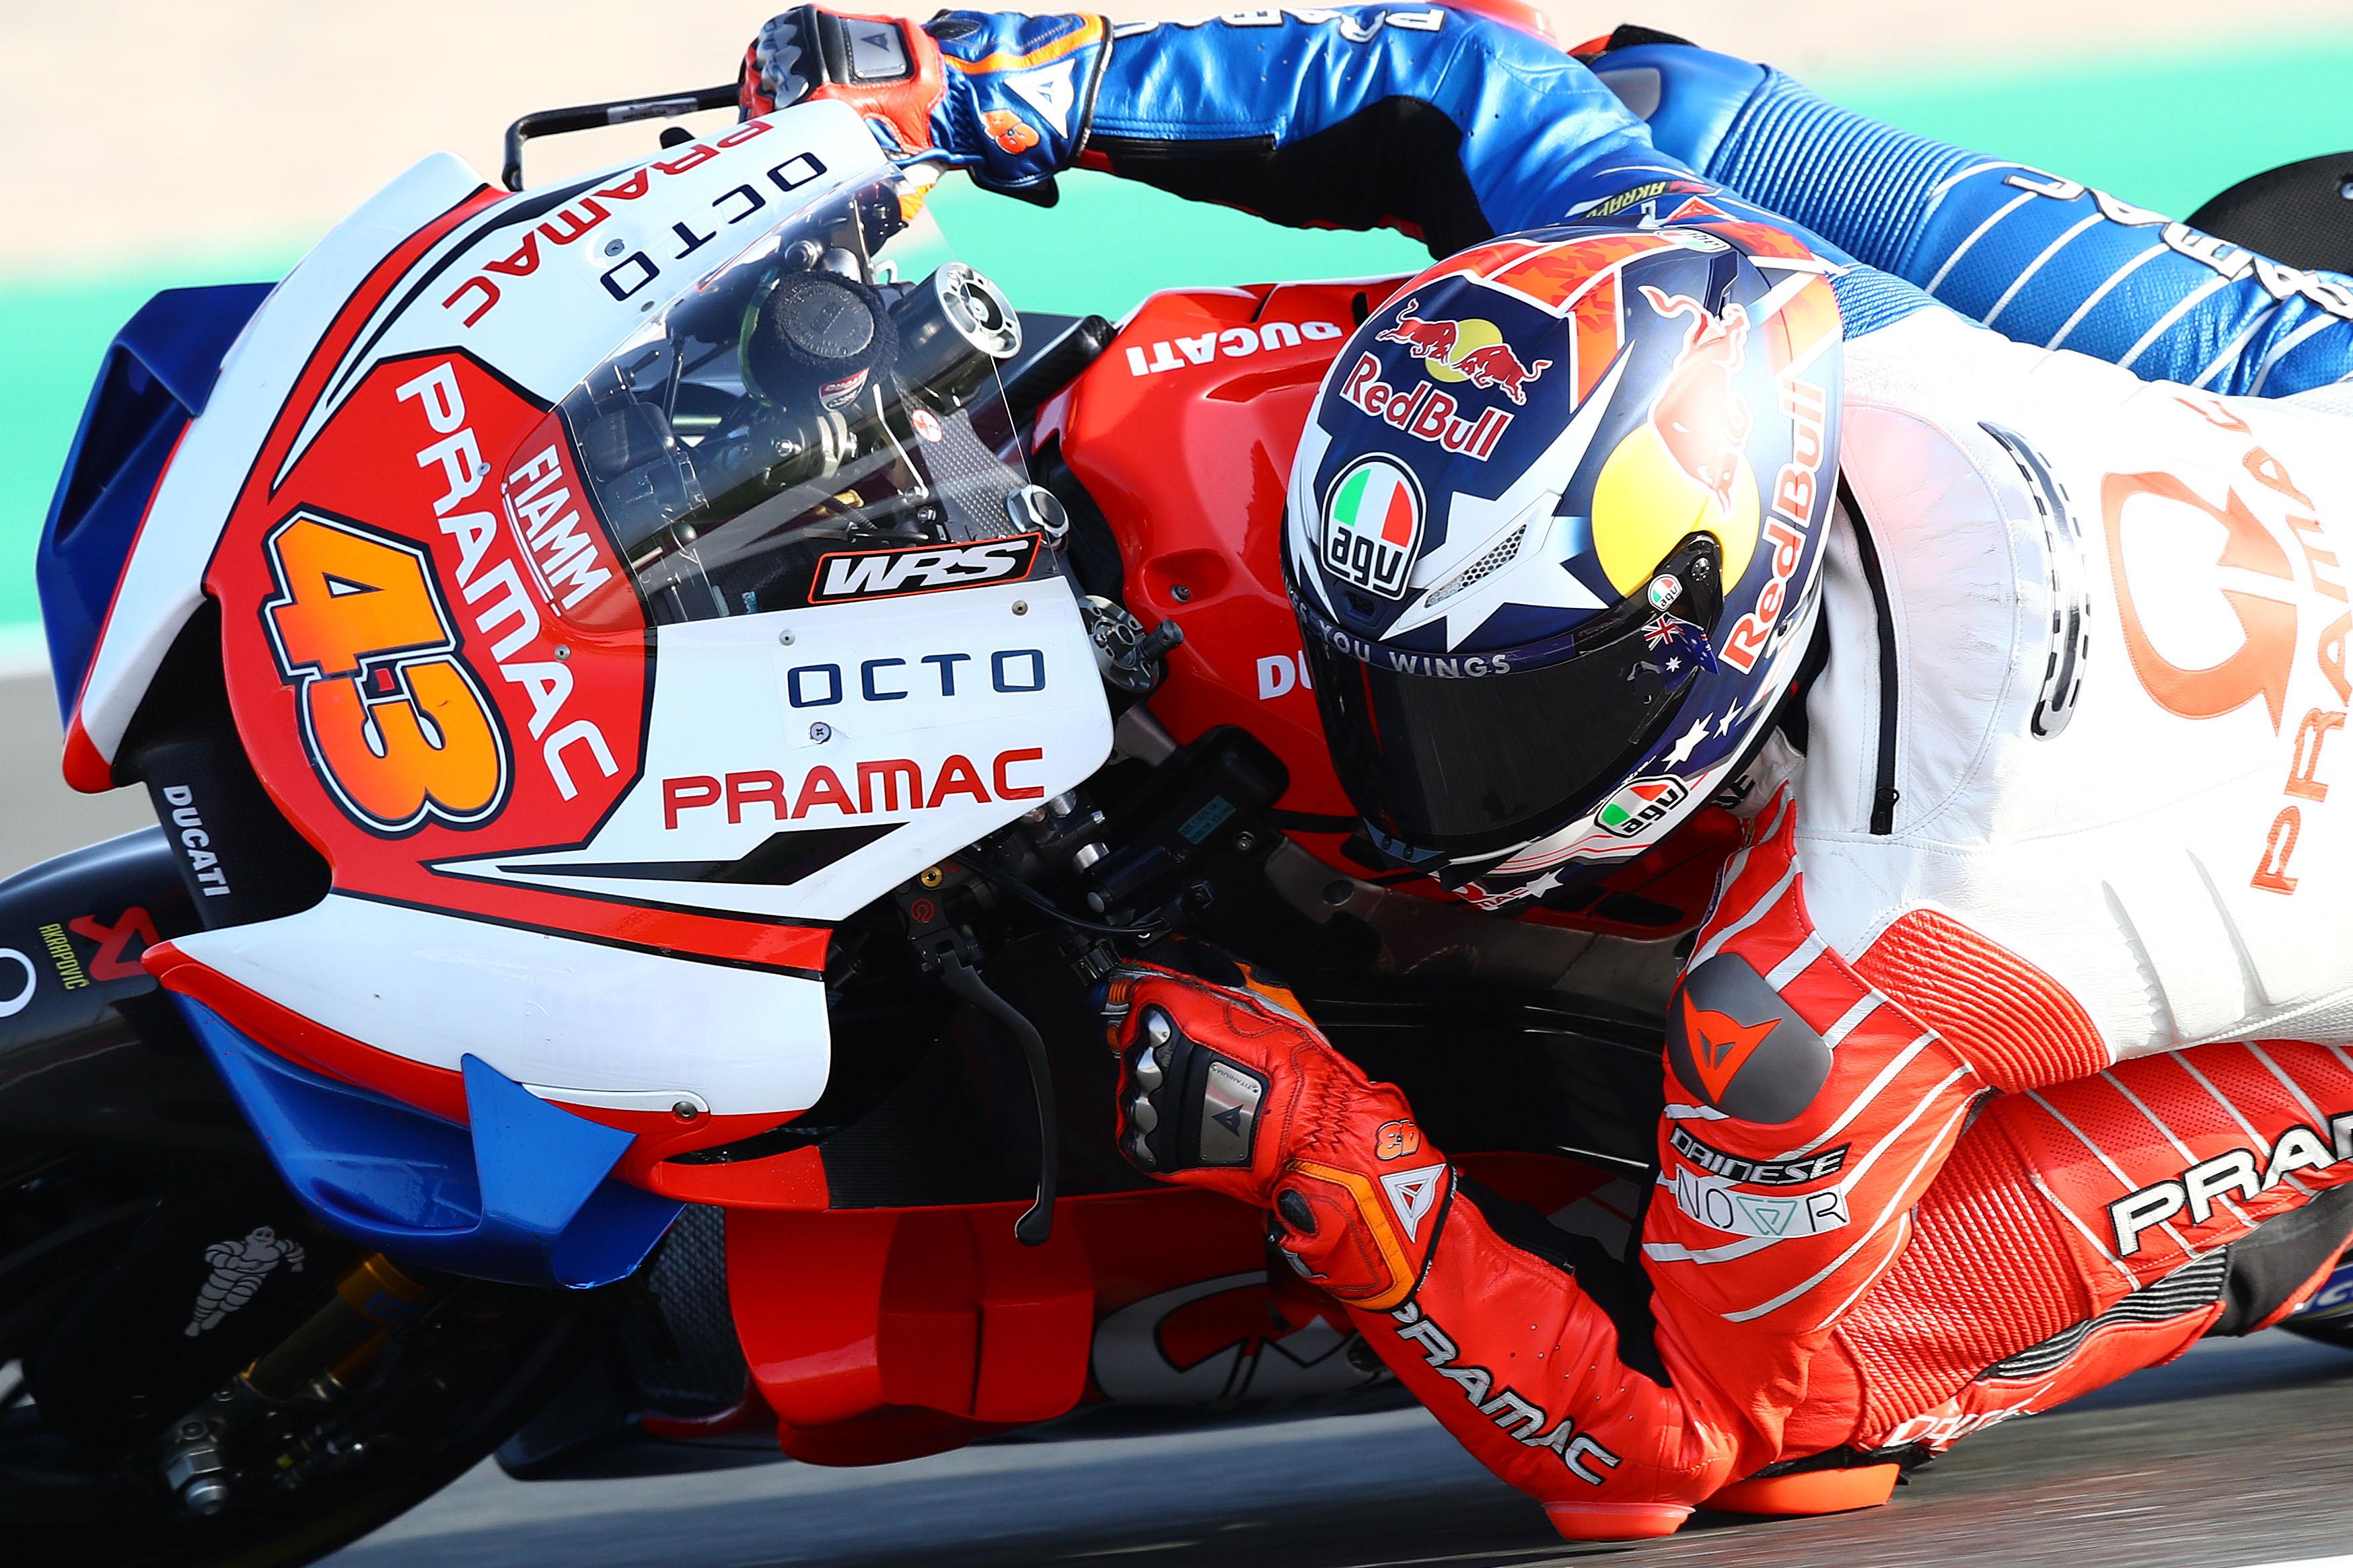 Jack Miller Pramac Ducati Qatar MotoGP test 2020